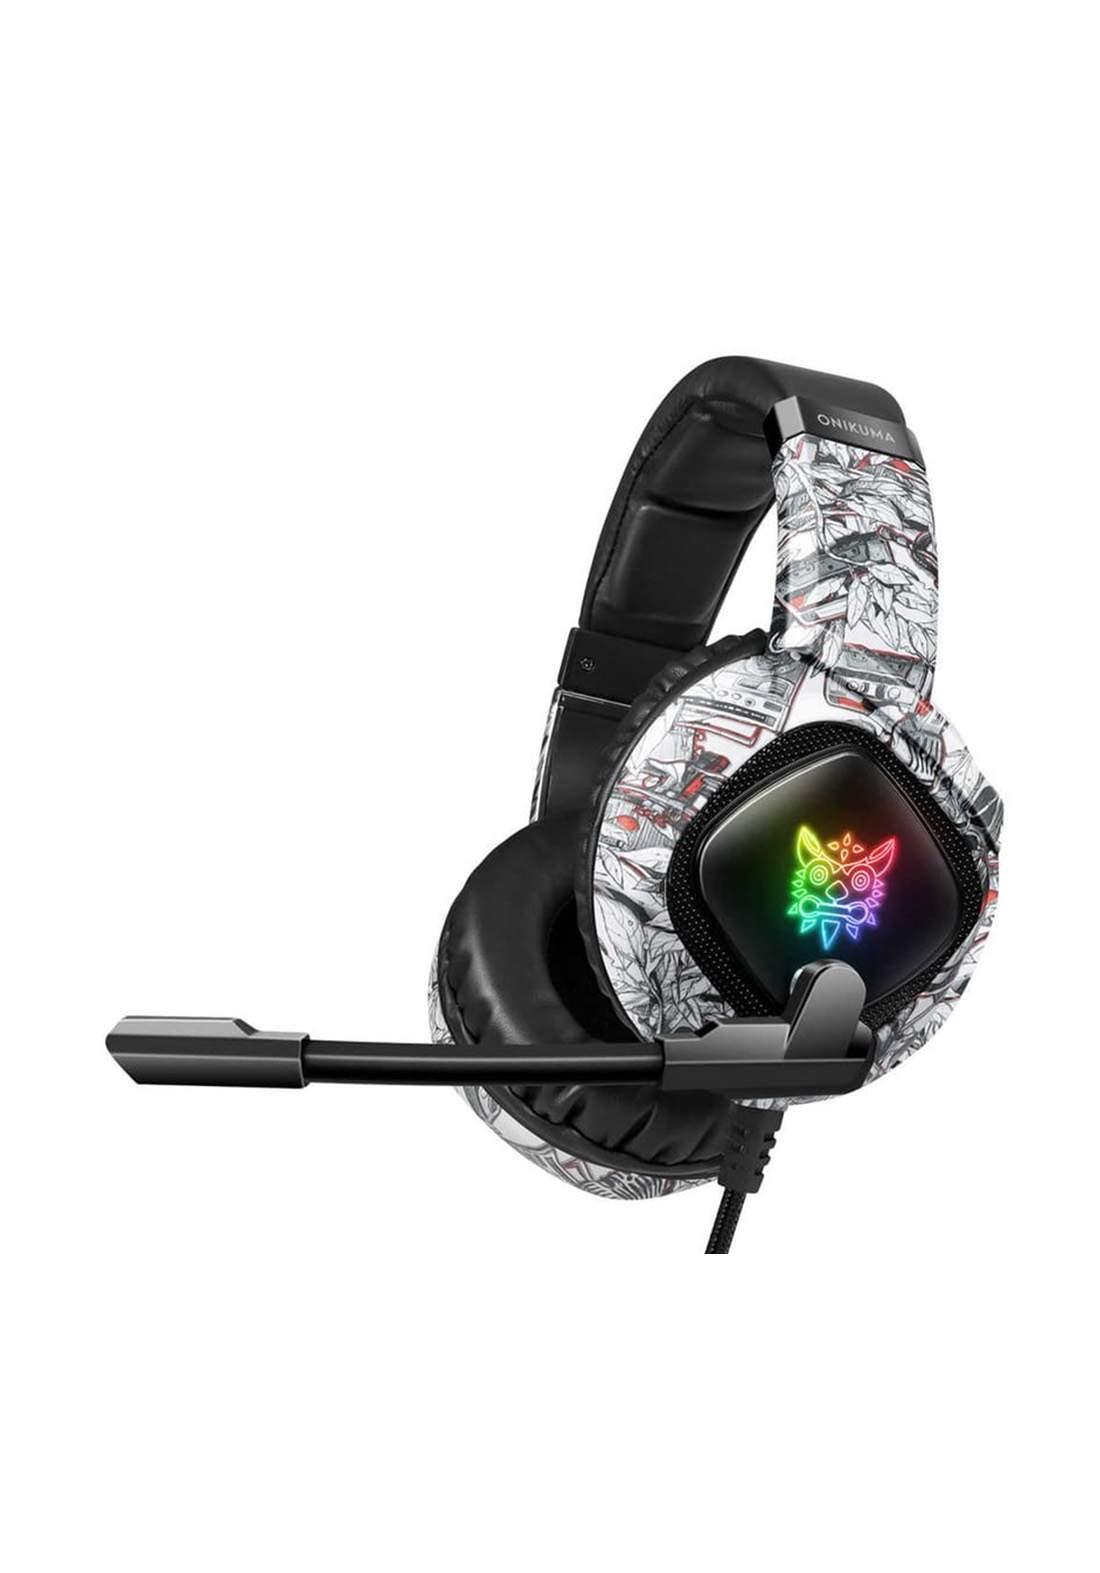 Onikuma K19 3.5mm Jack Stereo Gaming Headset Headphone LED Light - Black  سماعة رأس